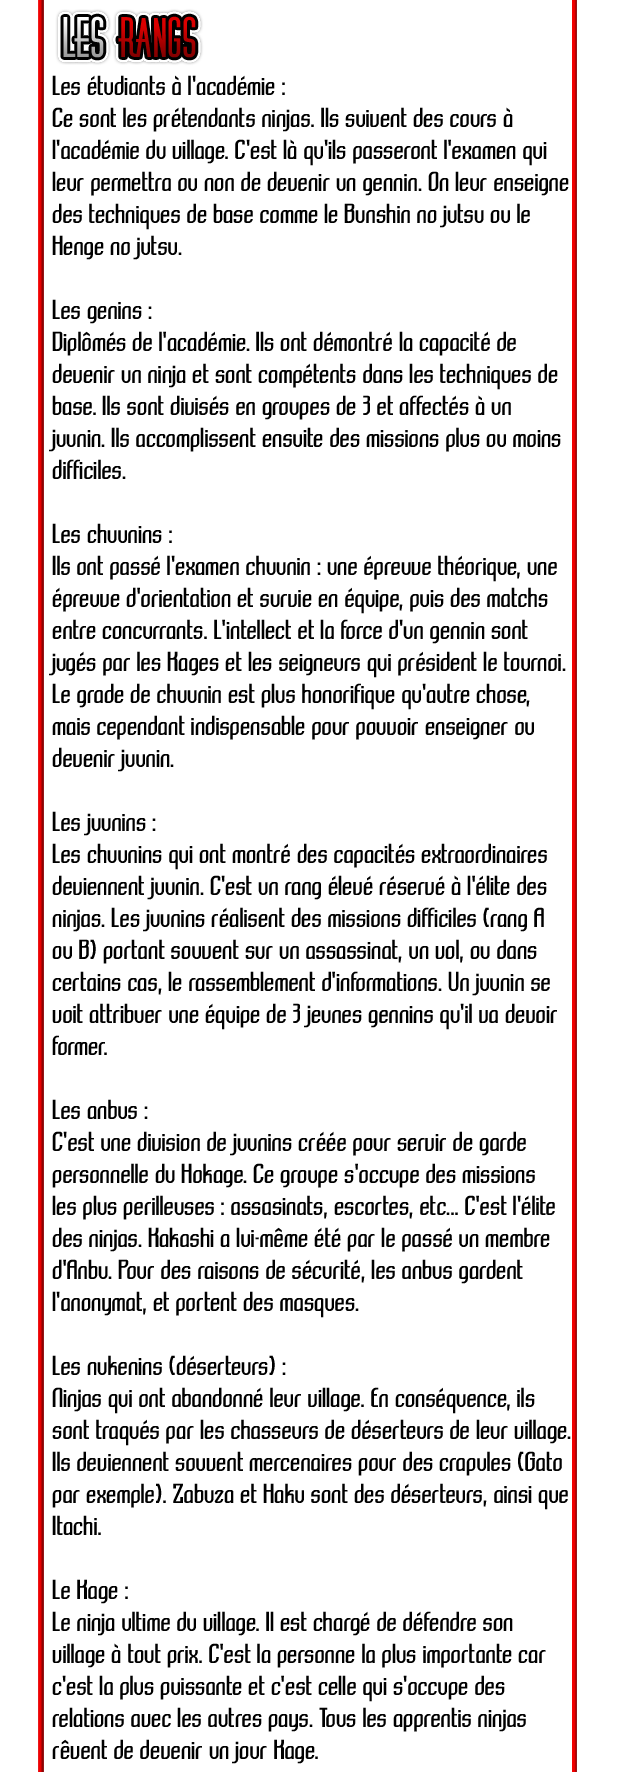 Shinobi - L'art d'être un ninja (cc) Rangs-3607370